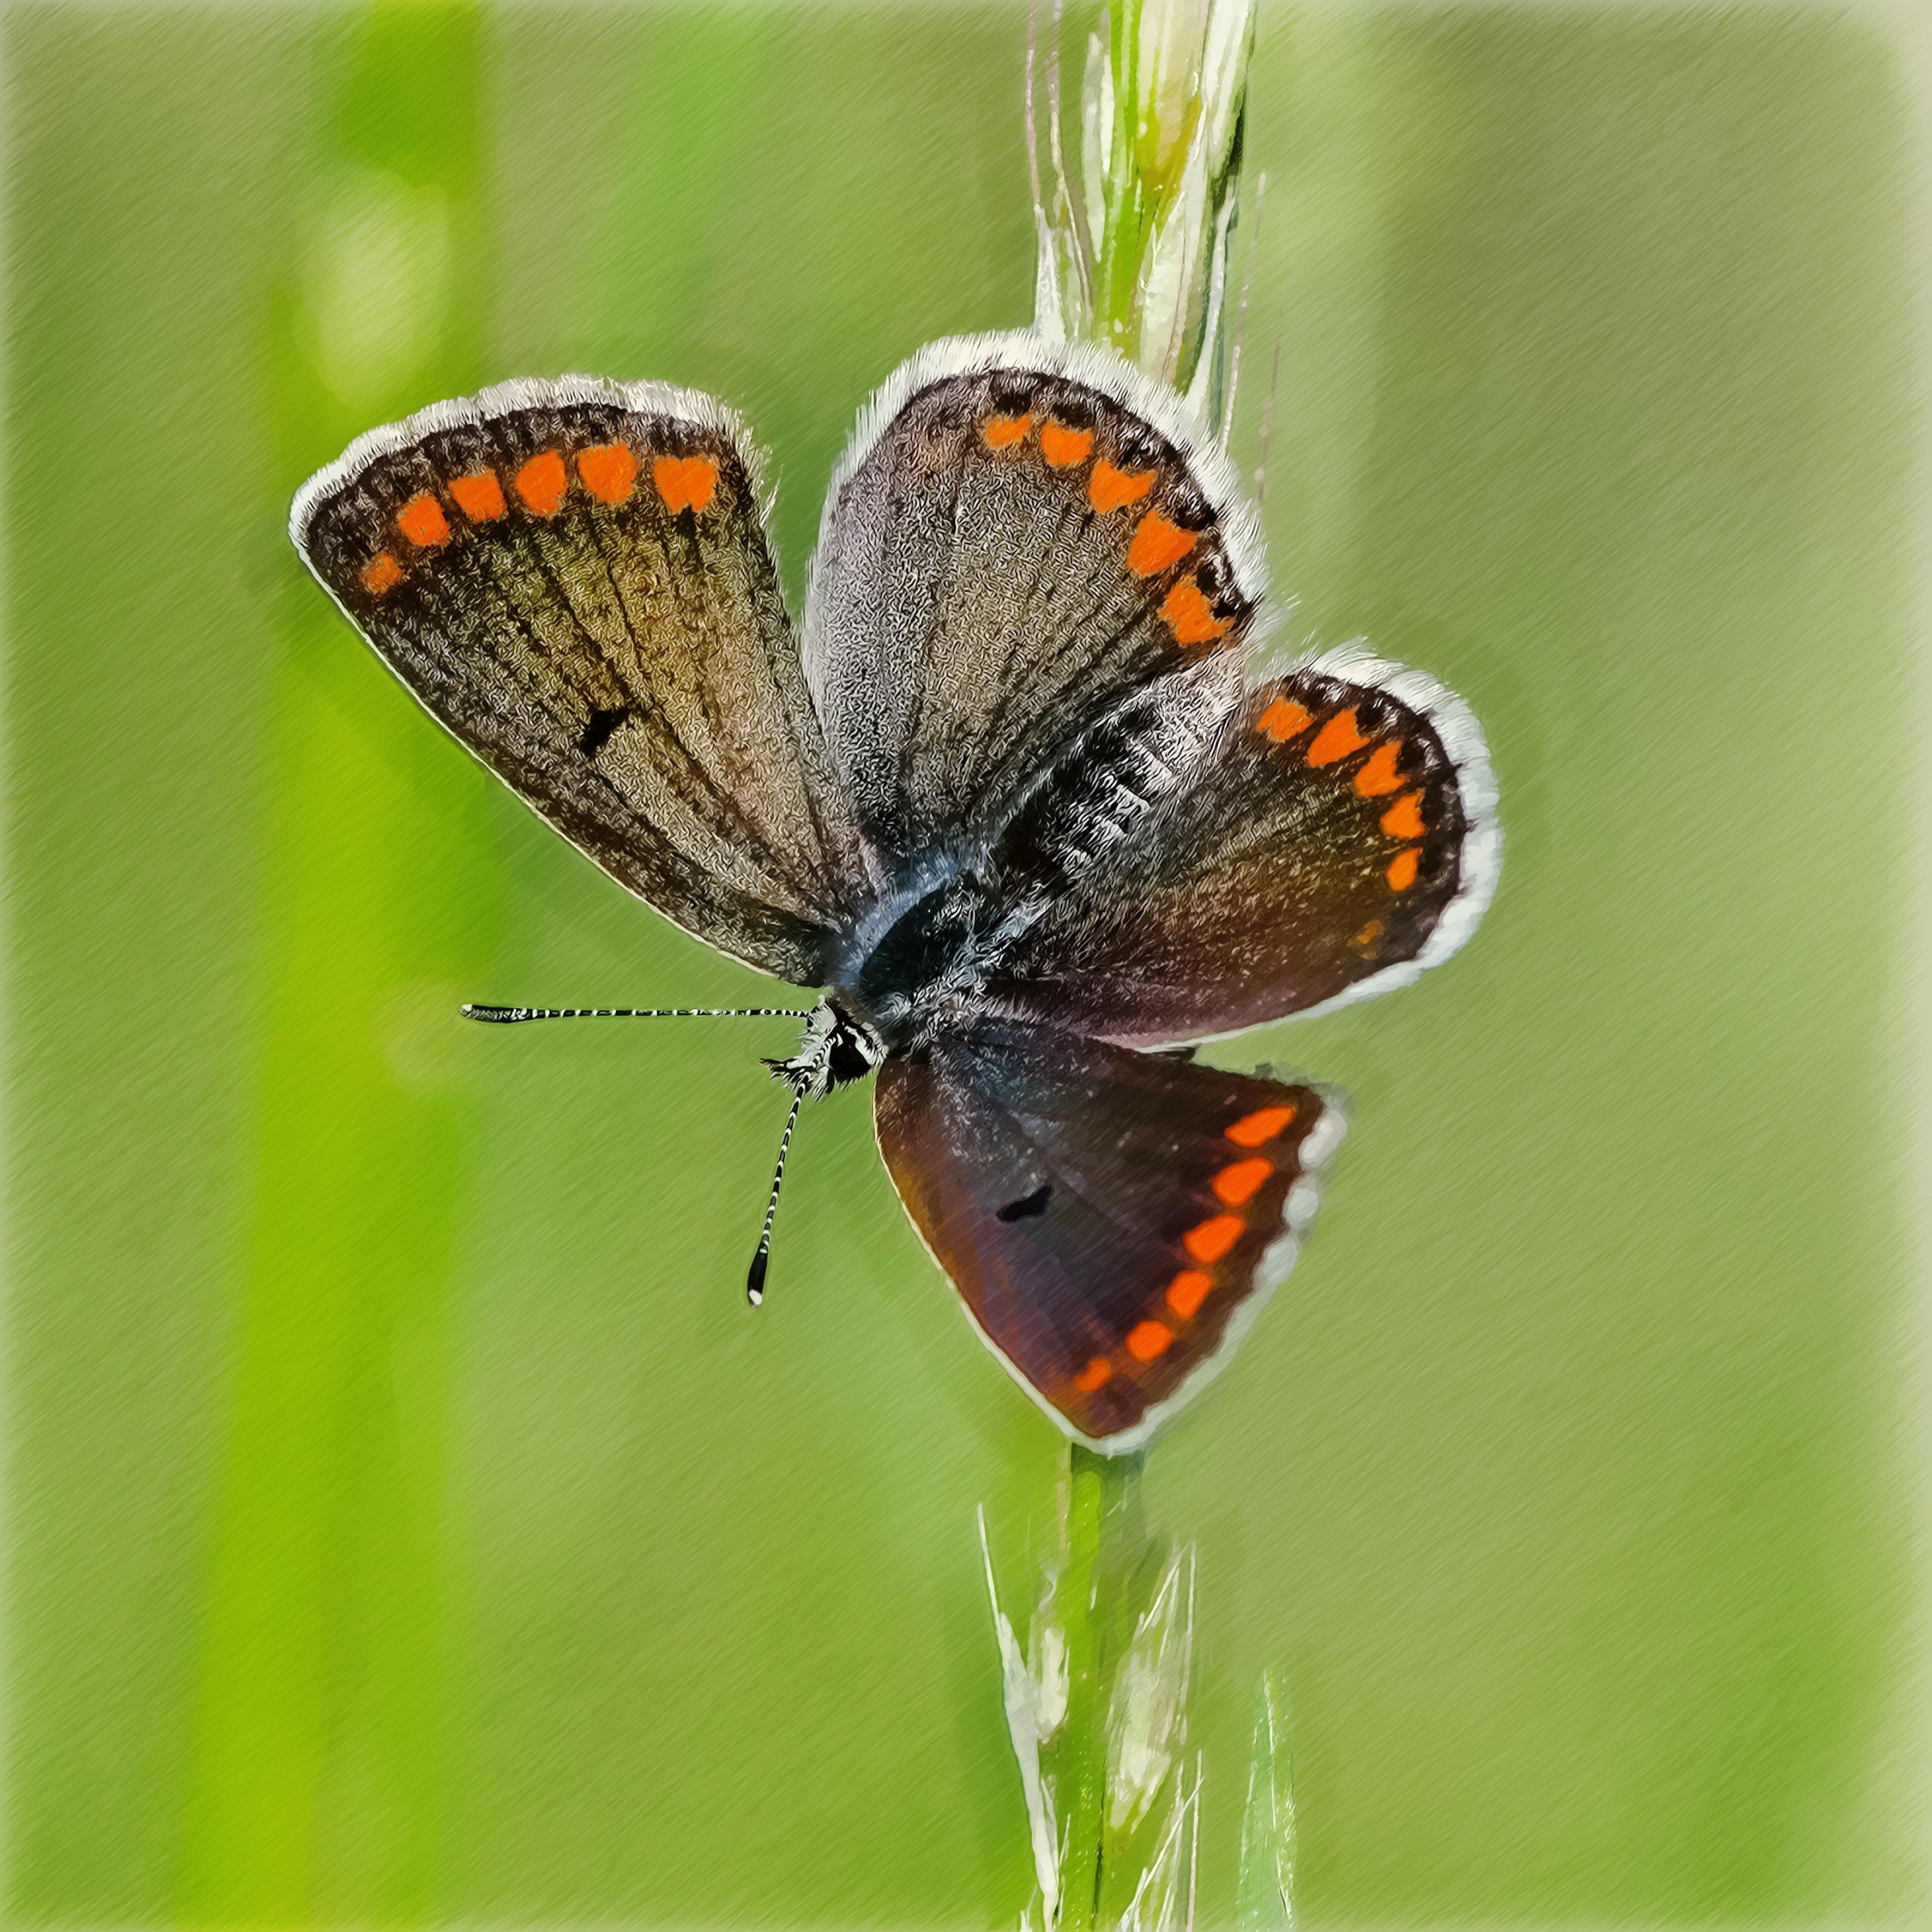 Fotos Gratis Insecto Pintar Polilla Invertebrado Art Dibujo